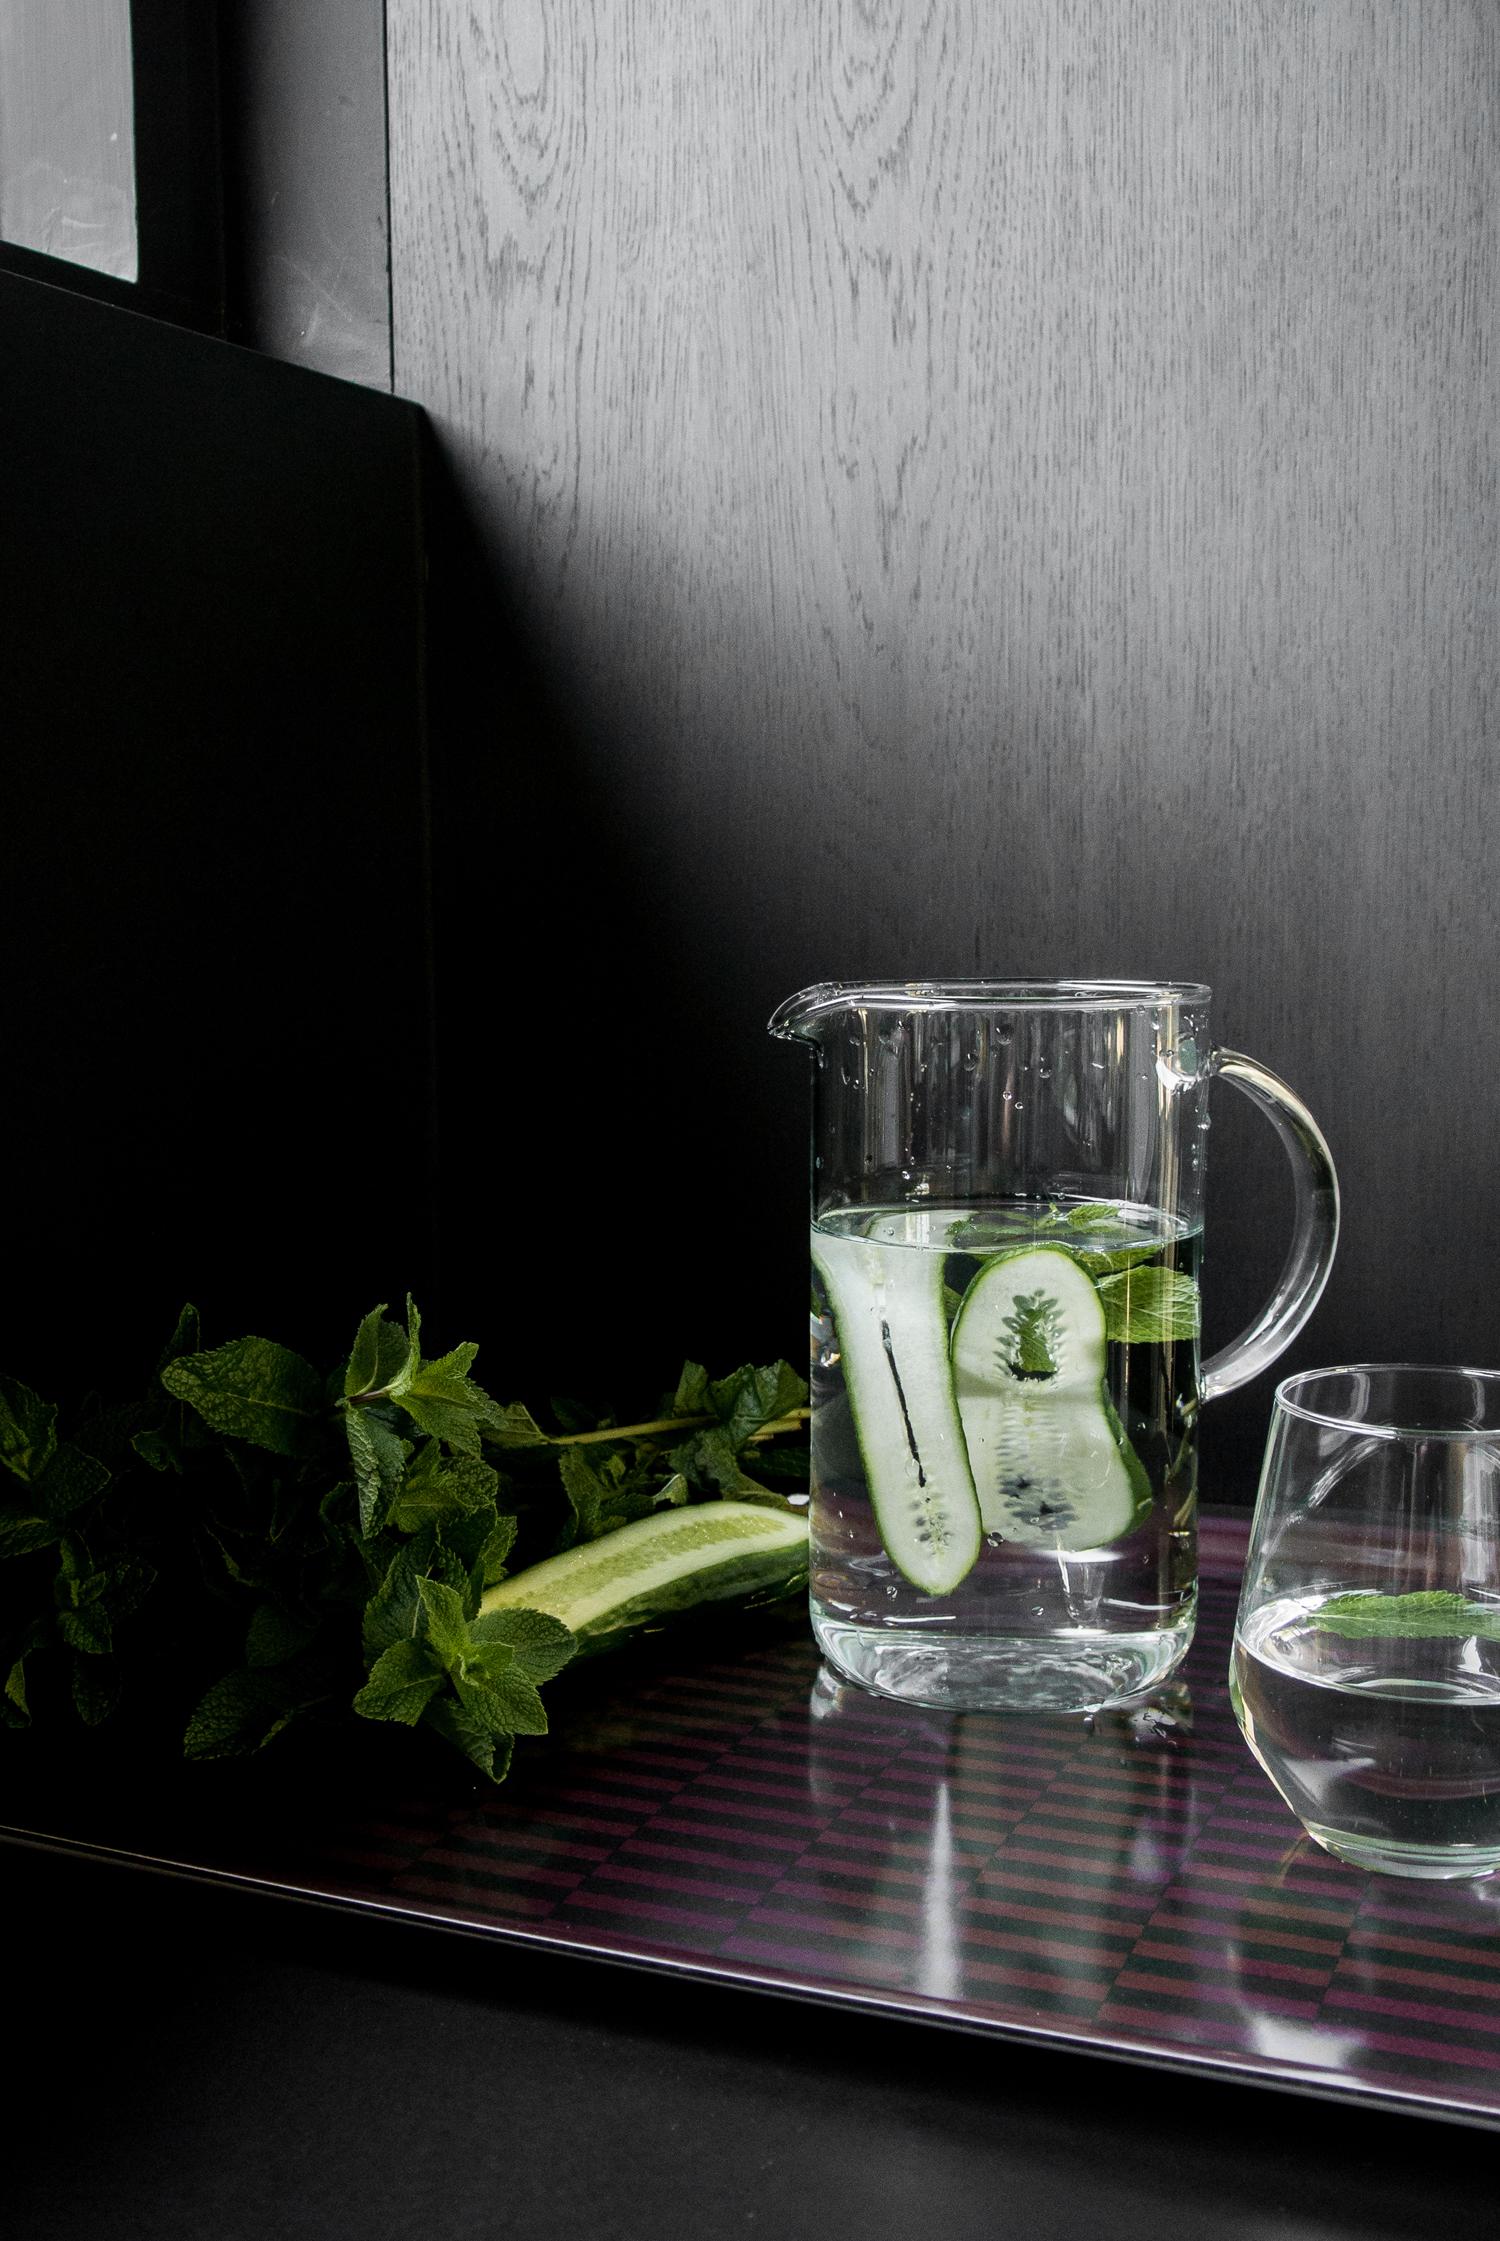 ikea-summer-water-aprilandmay-2.jpg